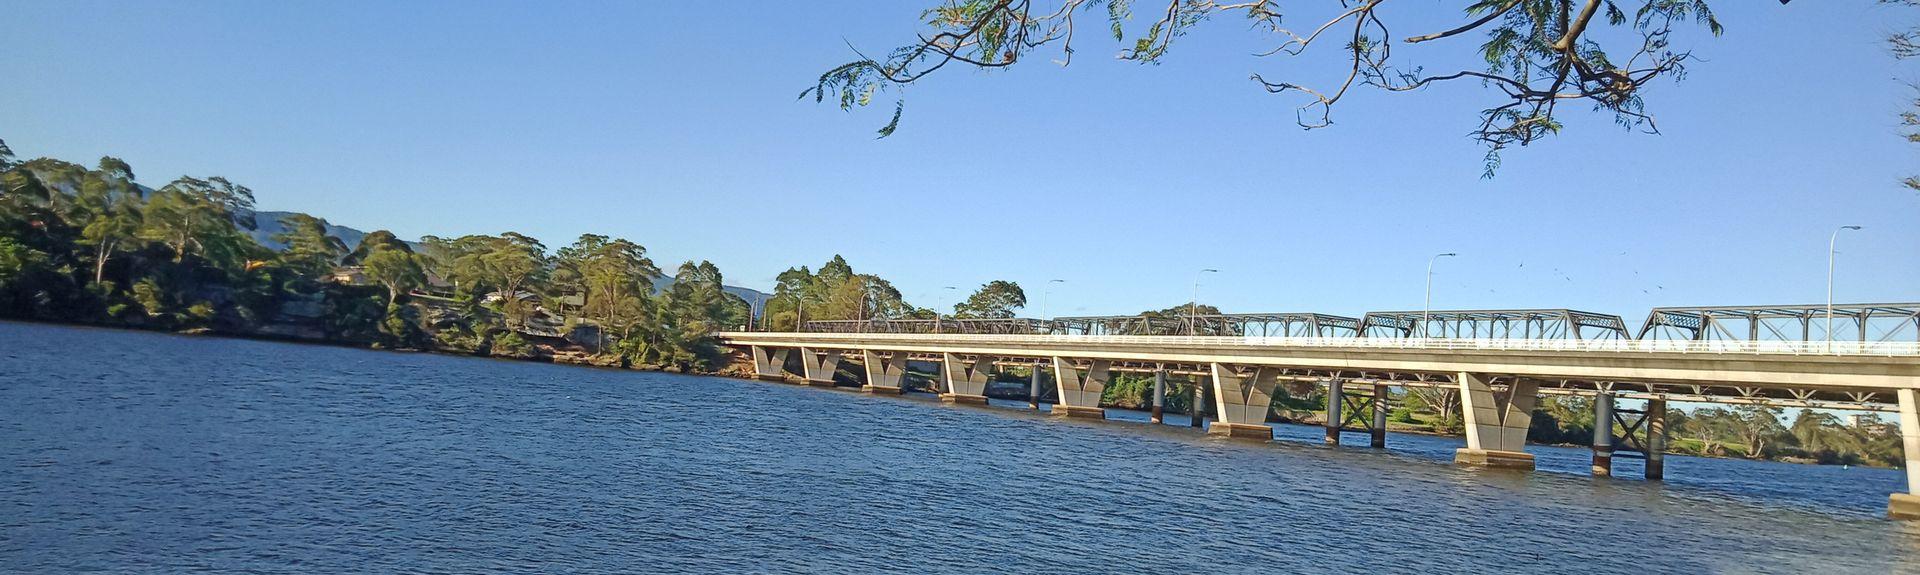 Orient Point NSW, Australia